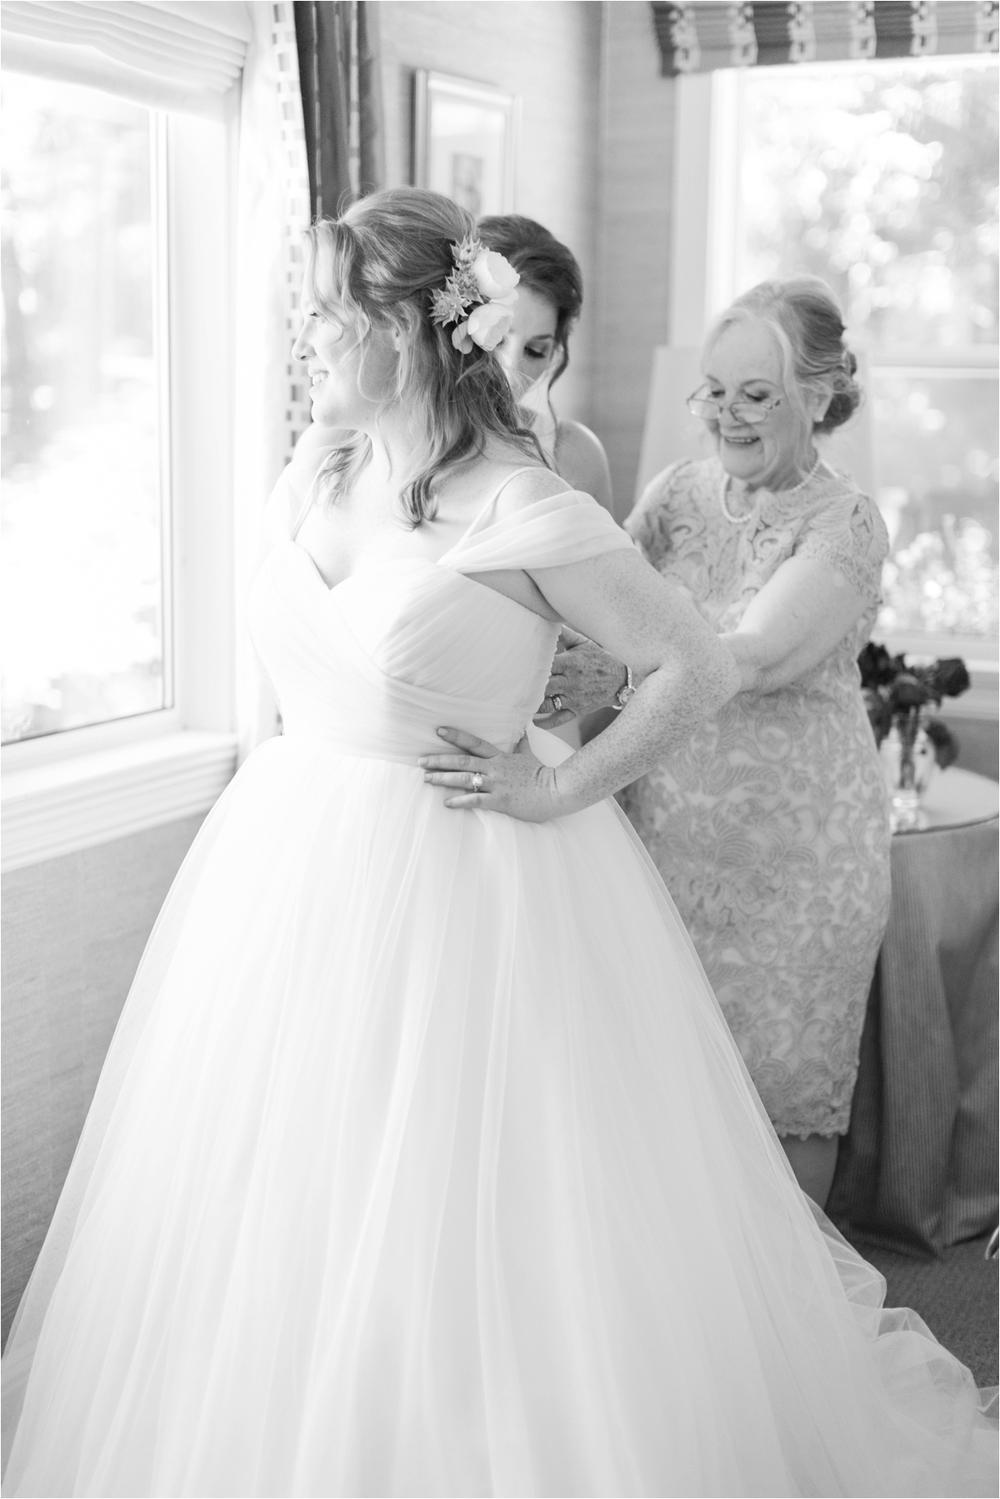 Nestldown wedding Photos by Briana Calderon Photography_0192.jpg